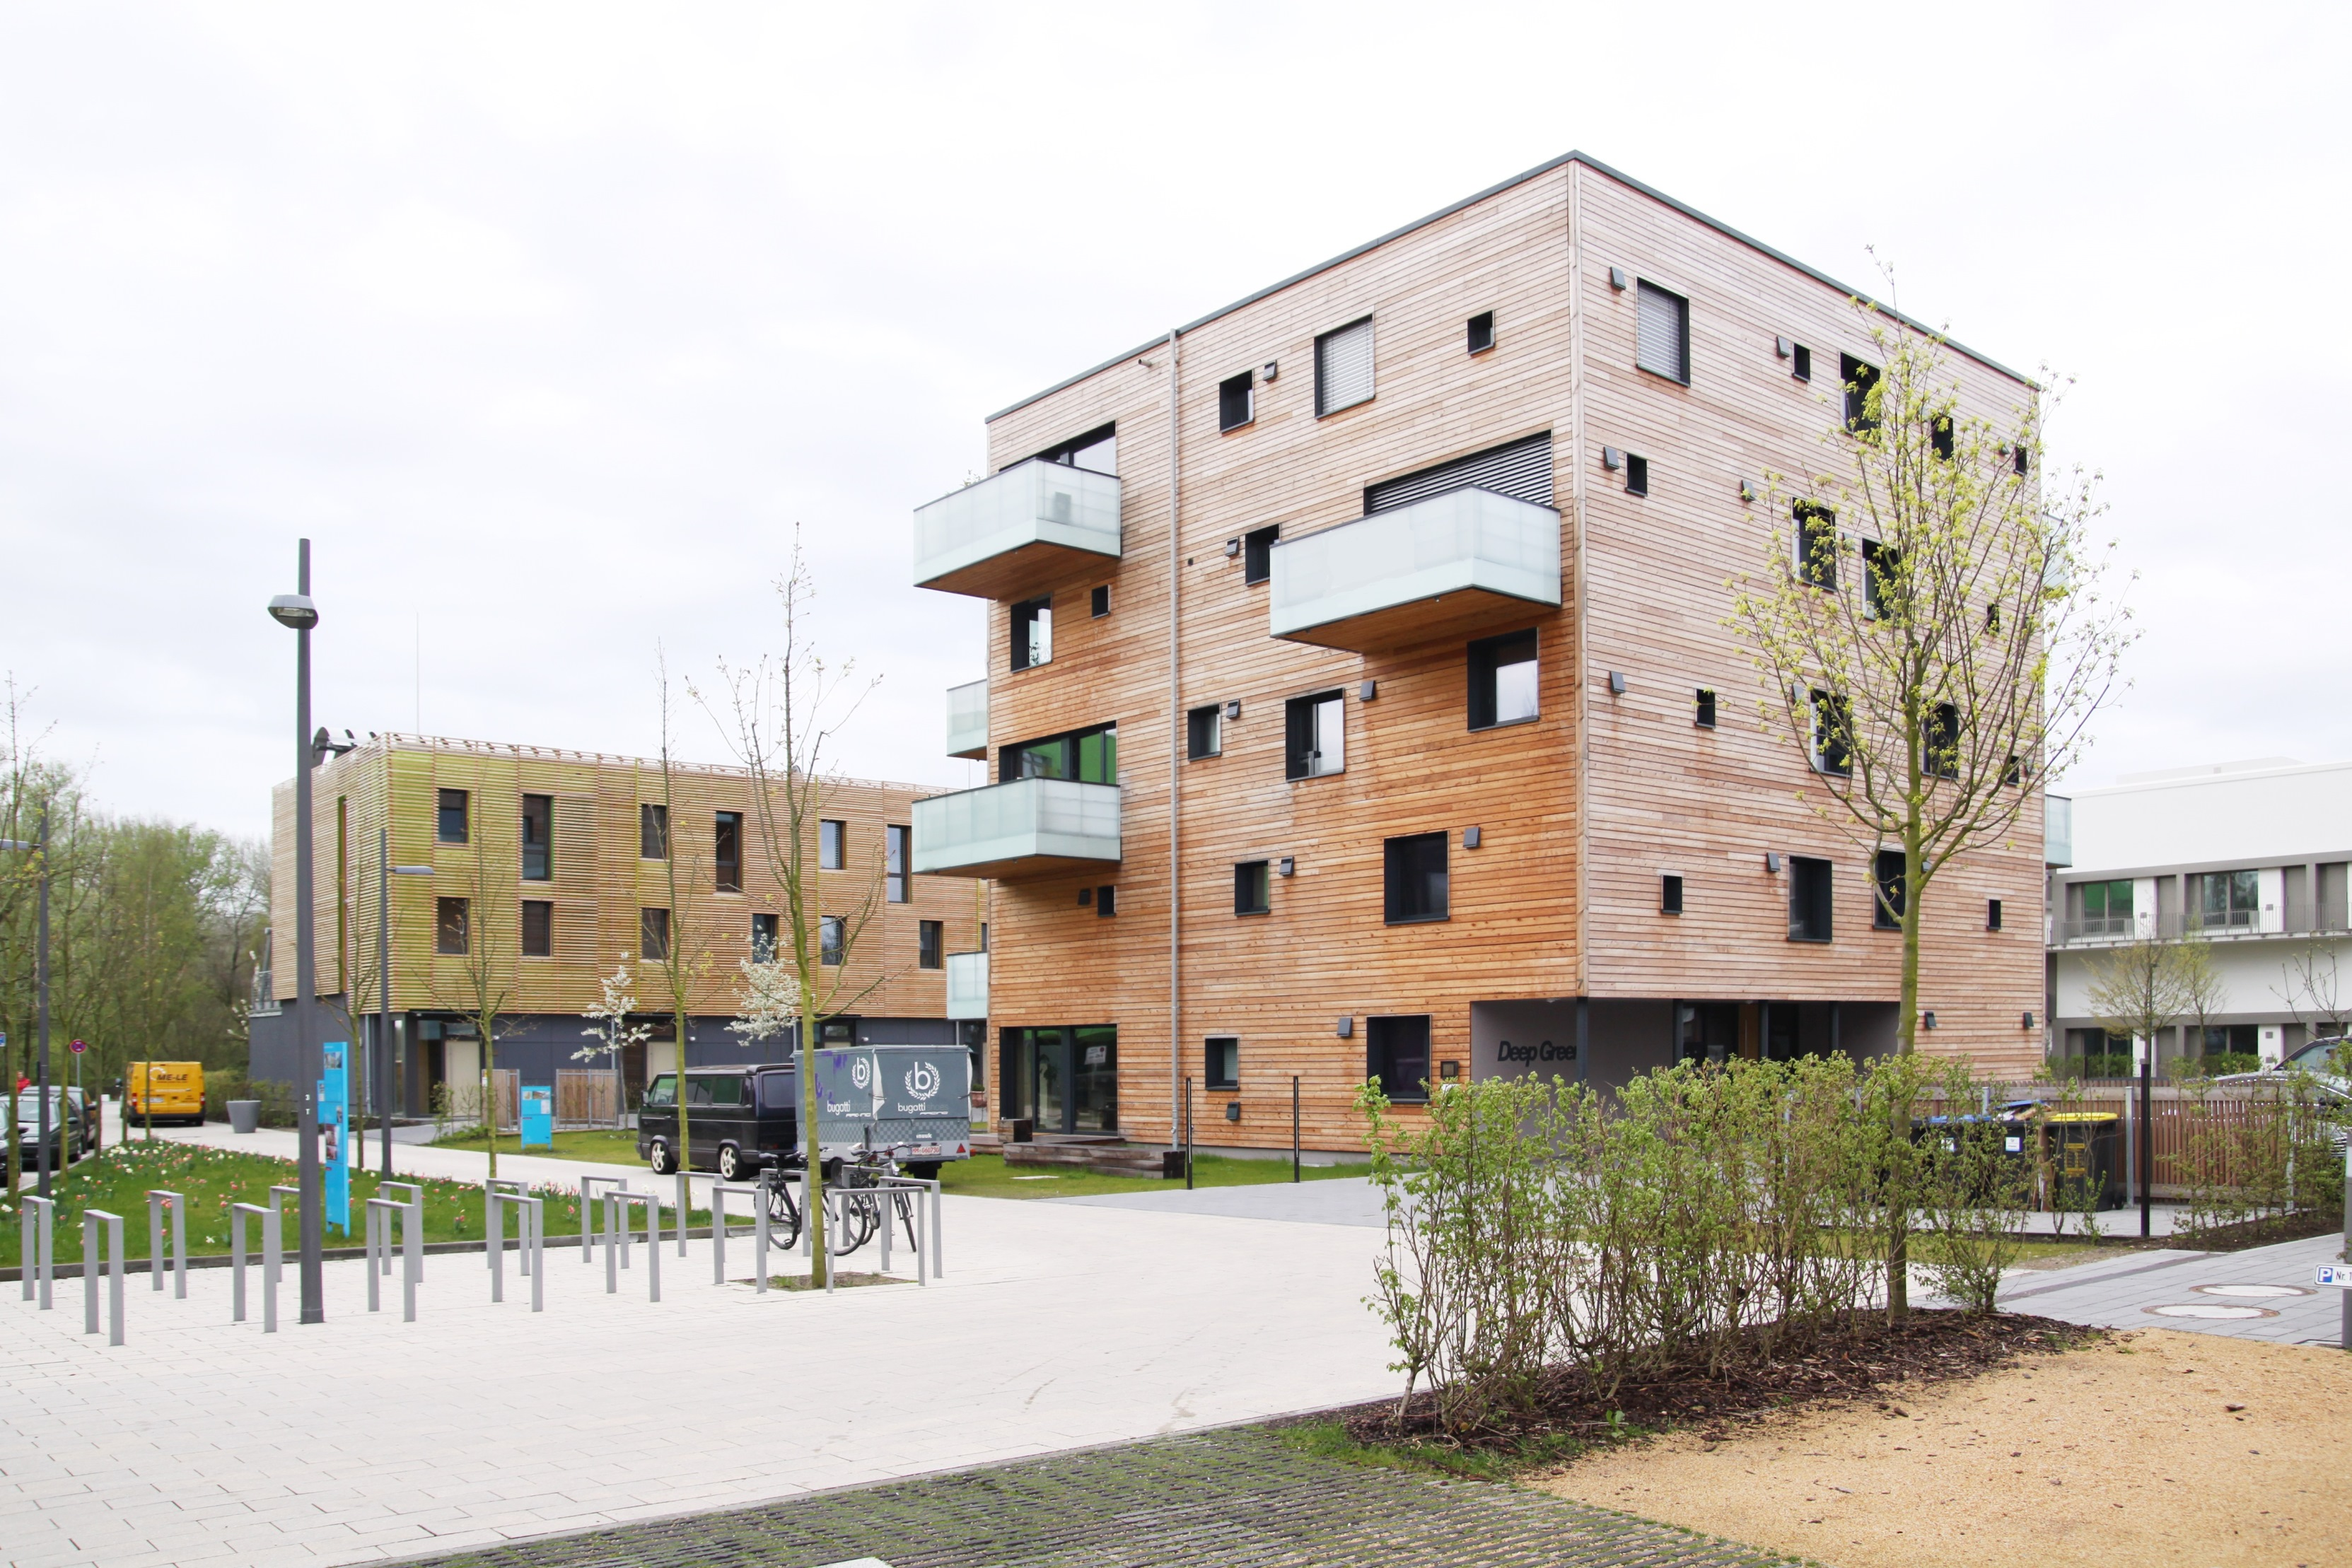 Ökologisch Wohnen im urbanen Raum-holzgemacht Holz100 - Baugruppe